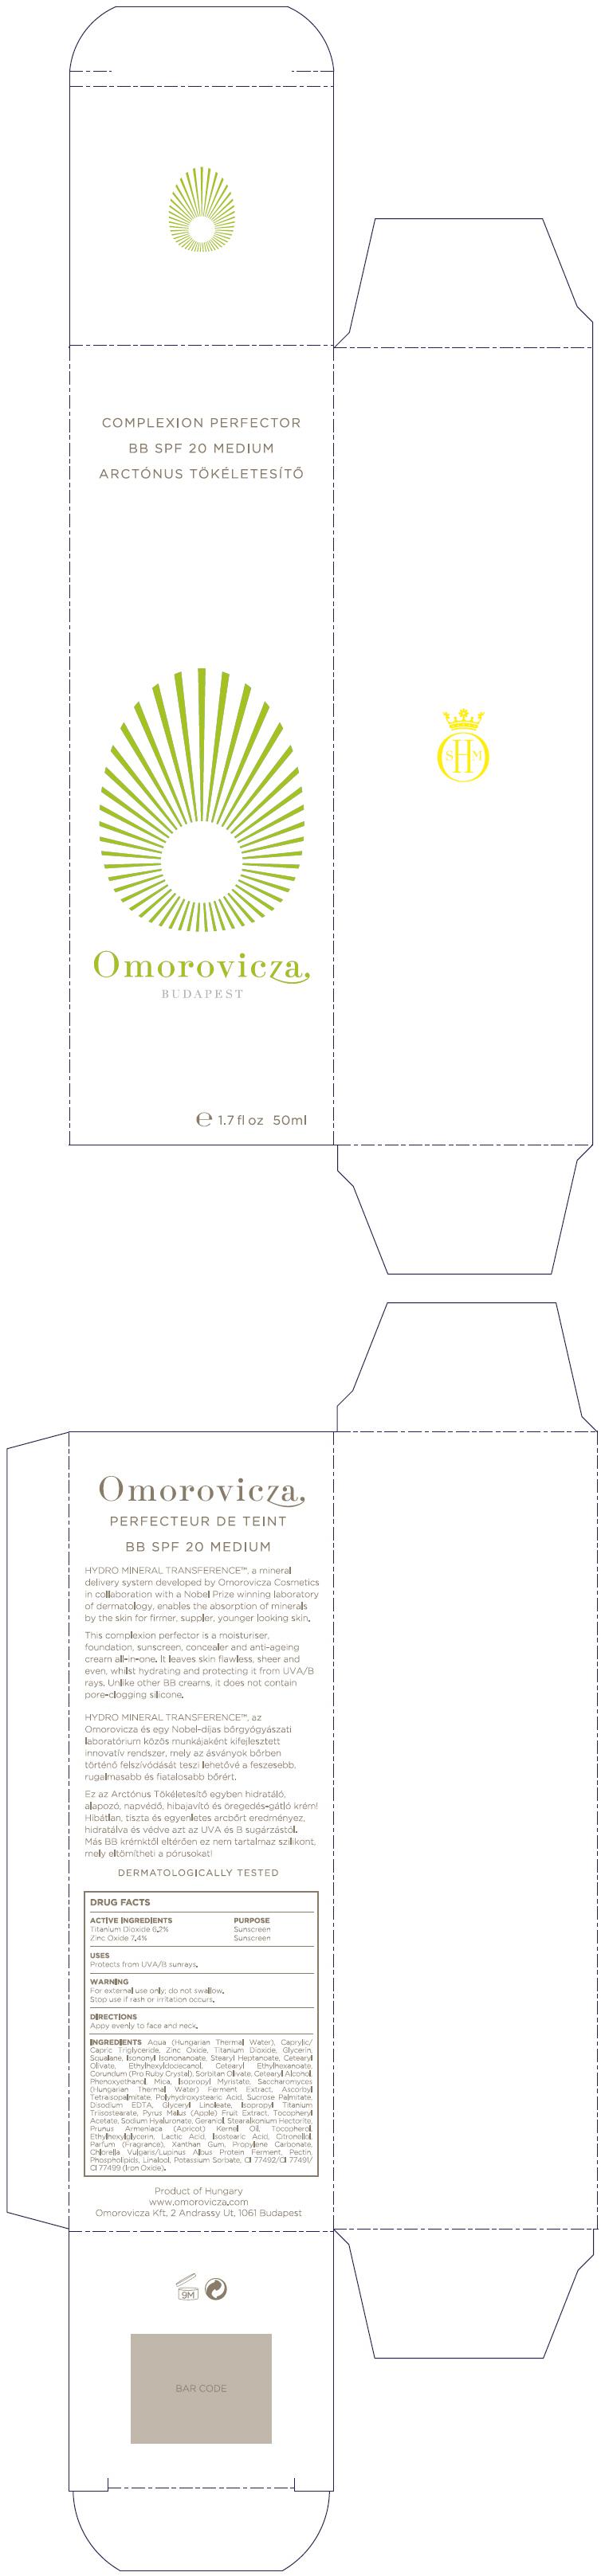 Complexion Perfector Bb Spf20 Medium (Titanium Dioxide And Zinc Oxide) Cream [Omorovicza Kozmetikai Kft.]